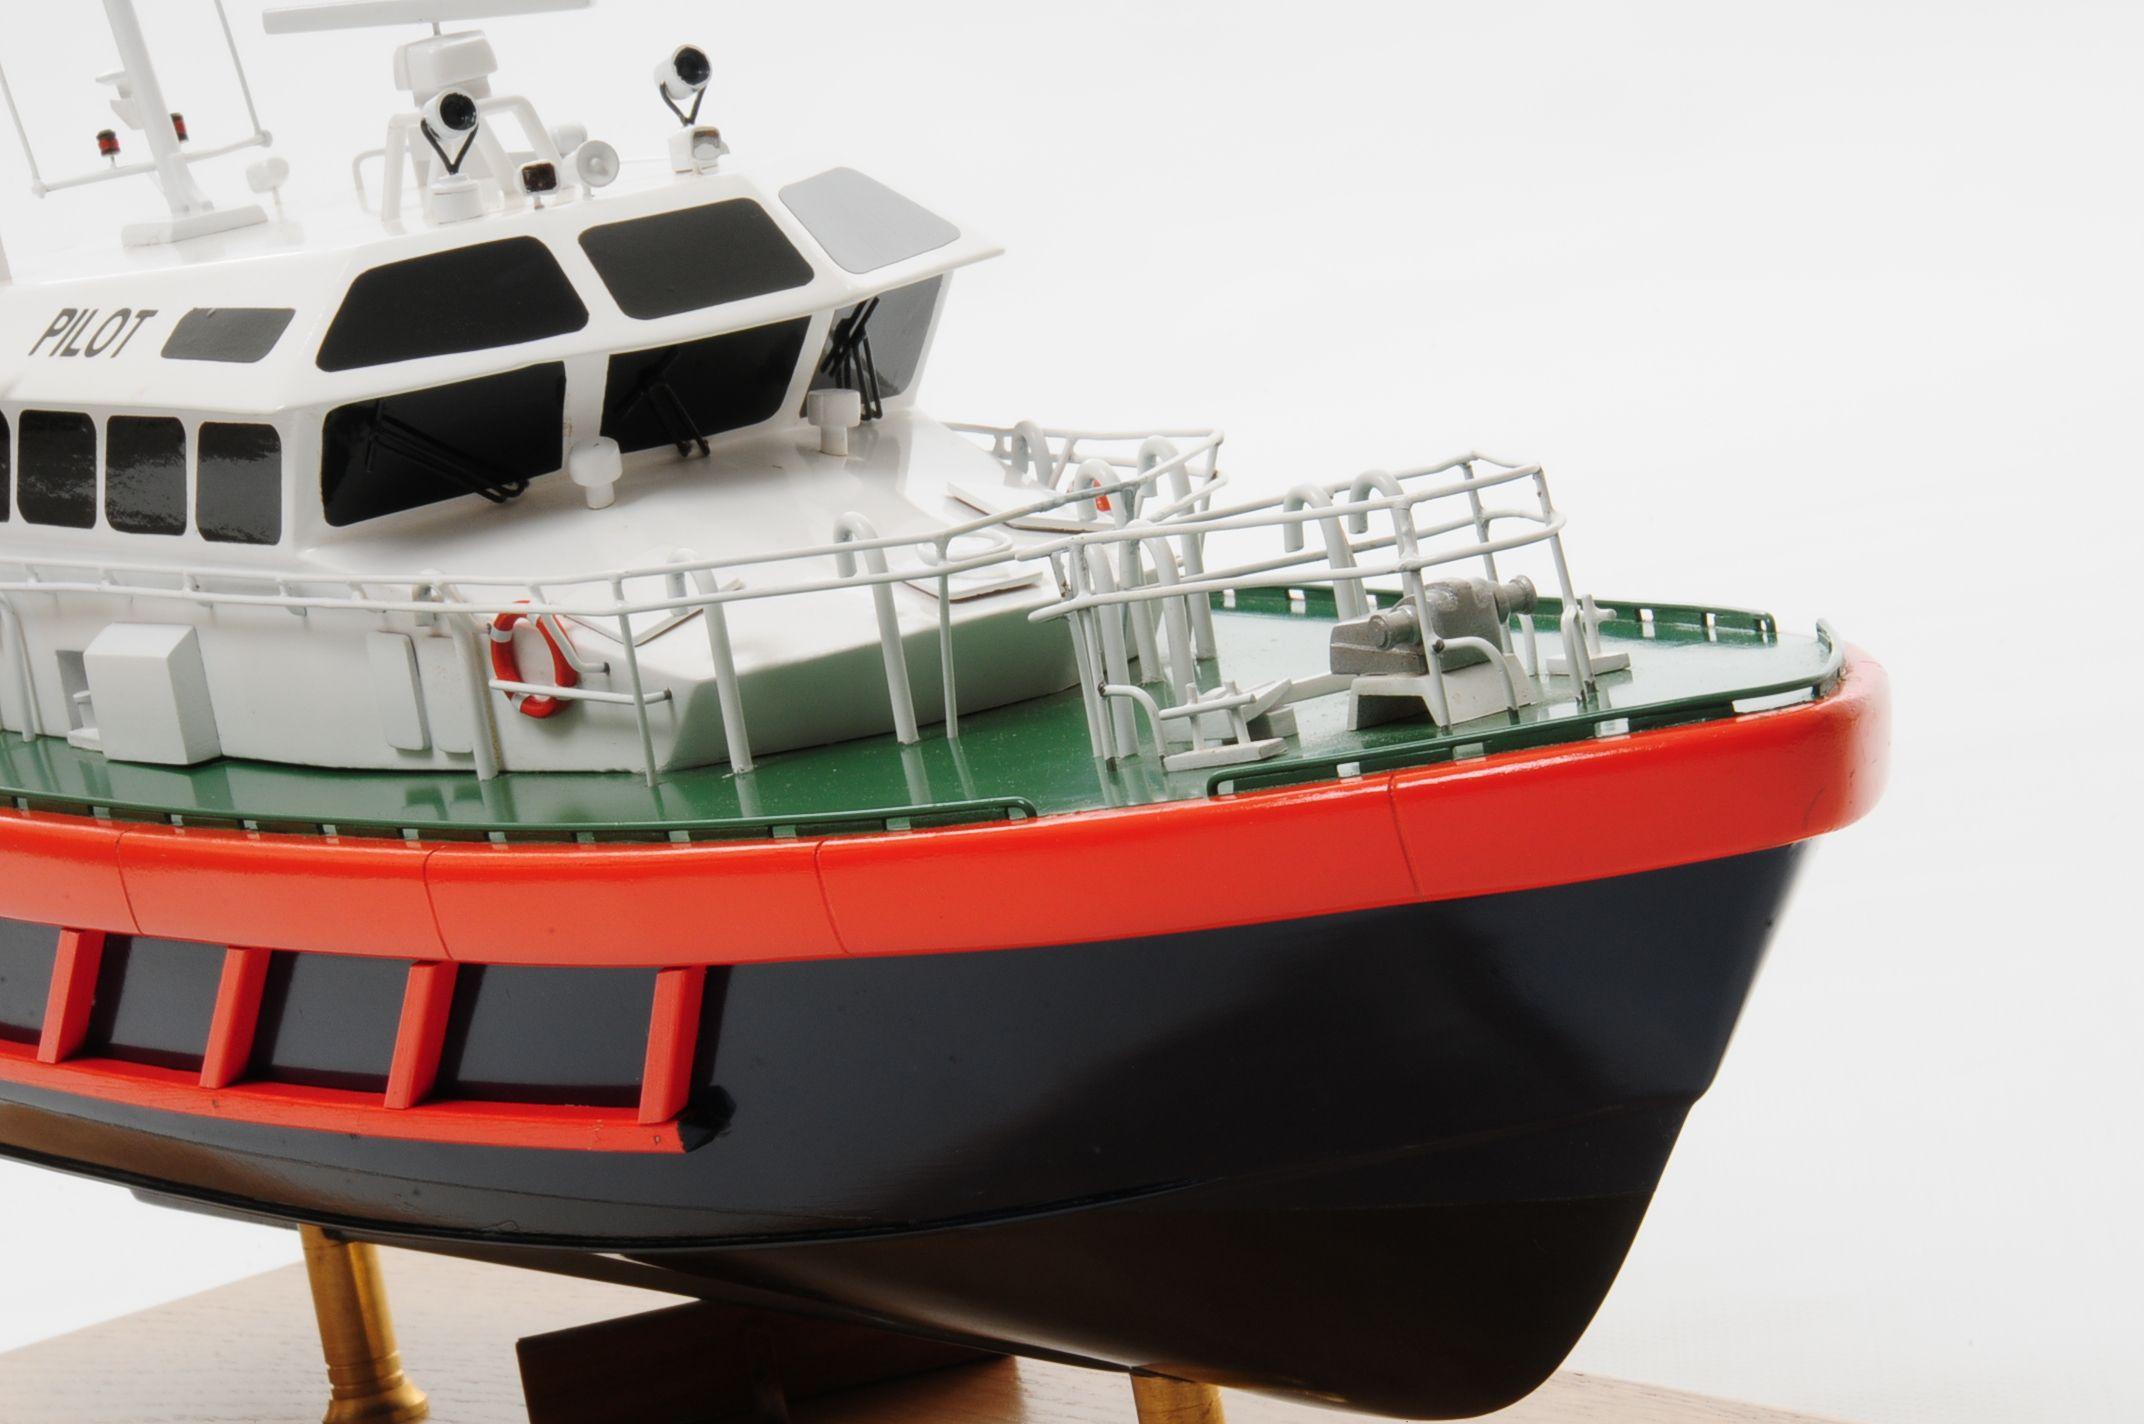 1247-6615-Orkney-Pilot-Vessel